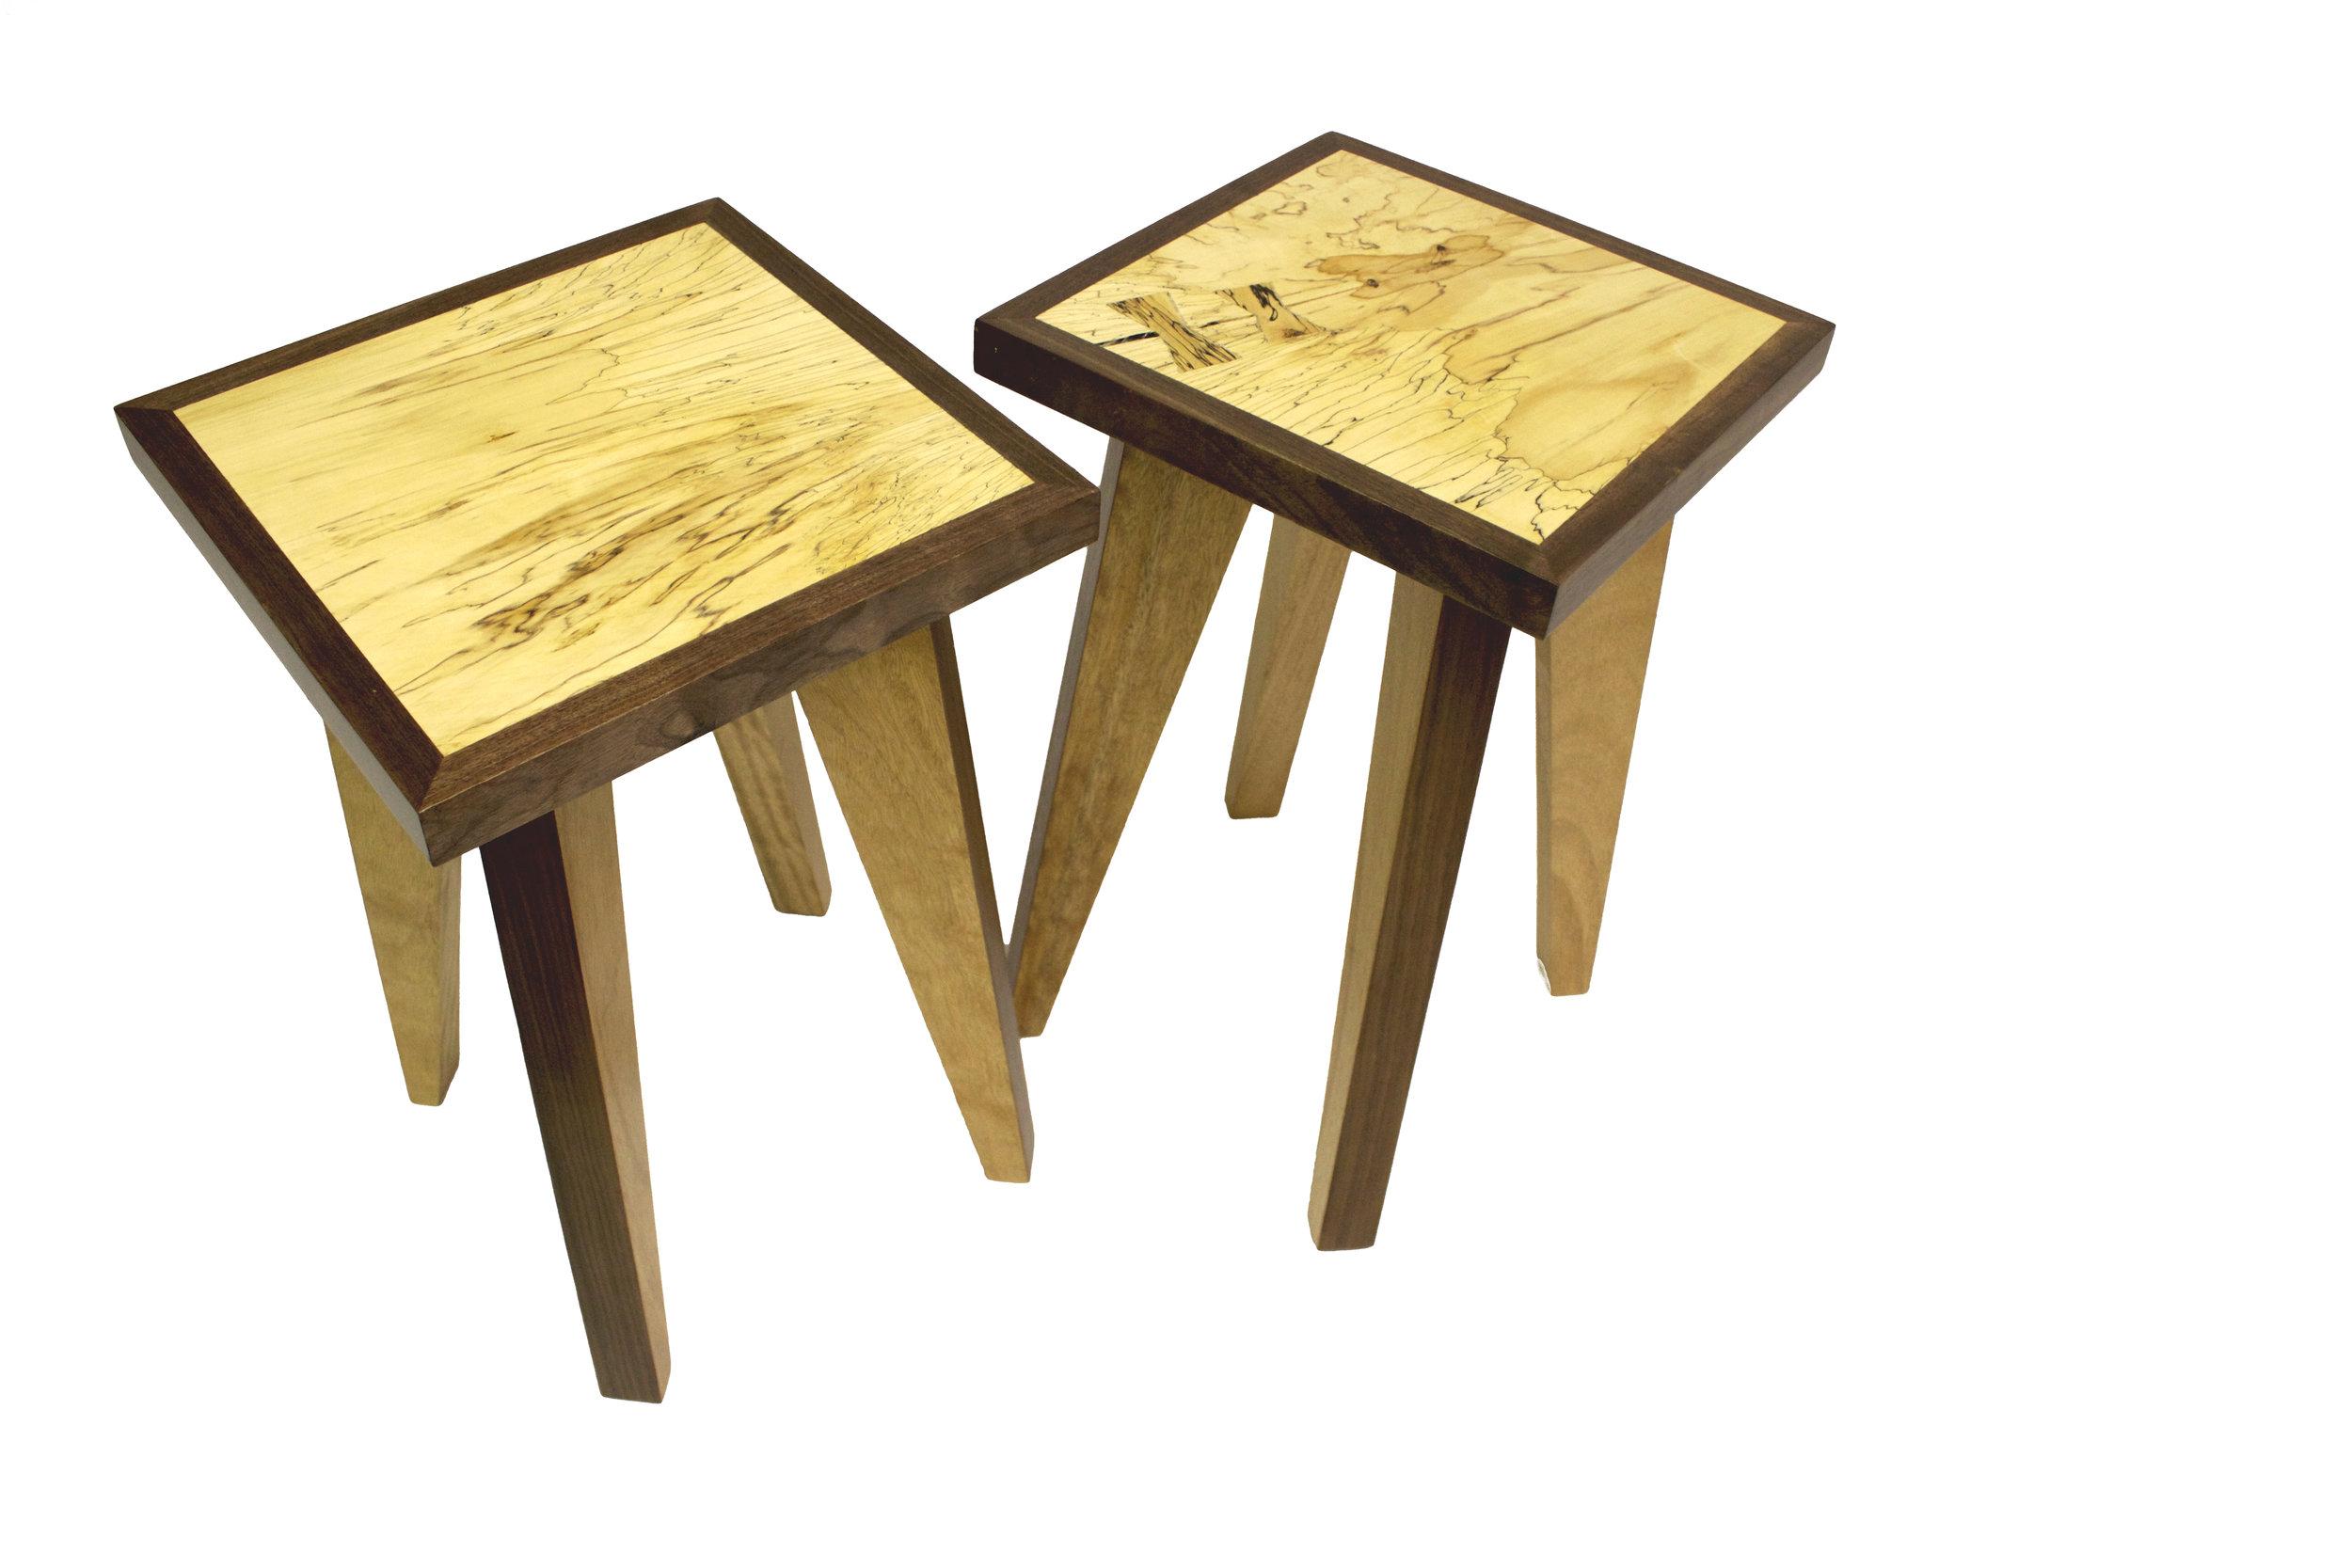 Spatled beech side tables